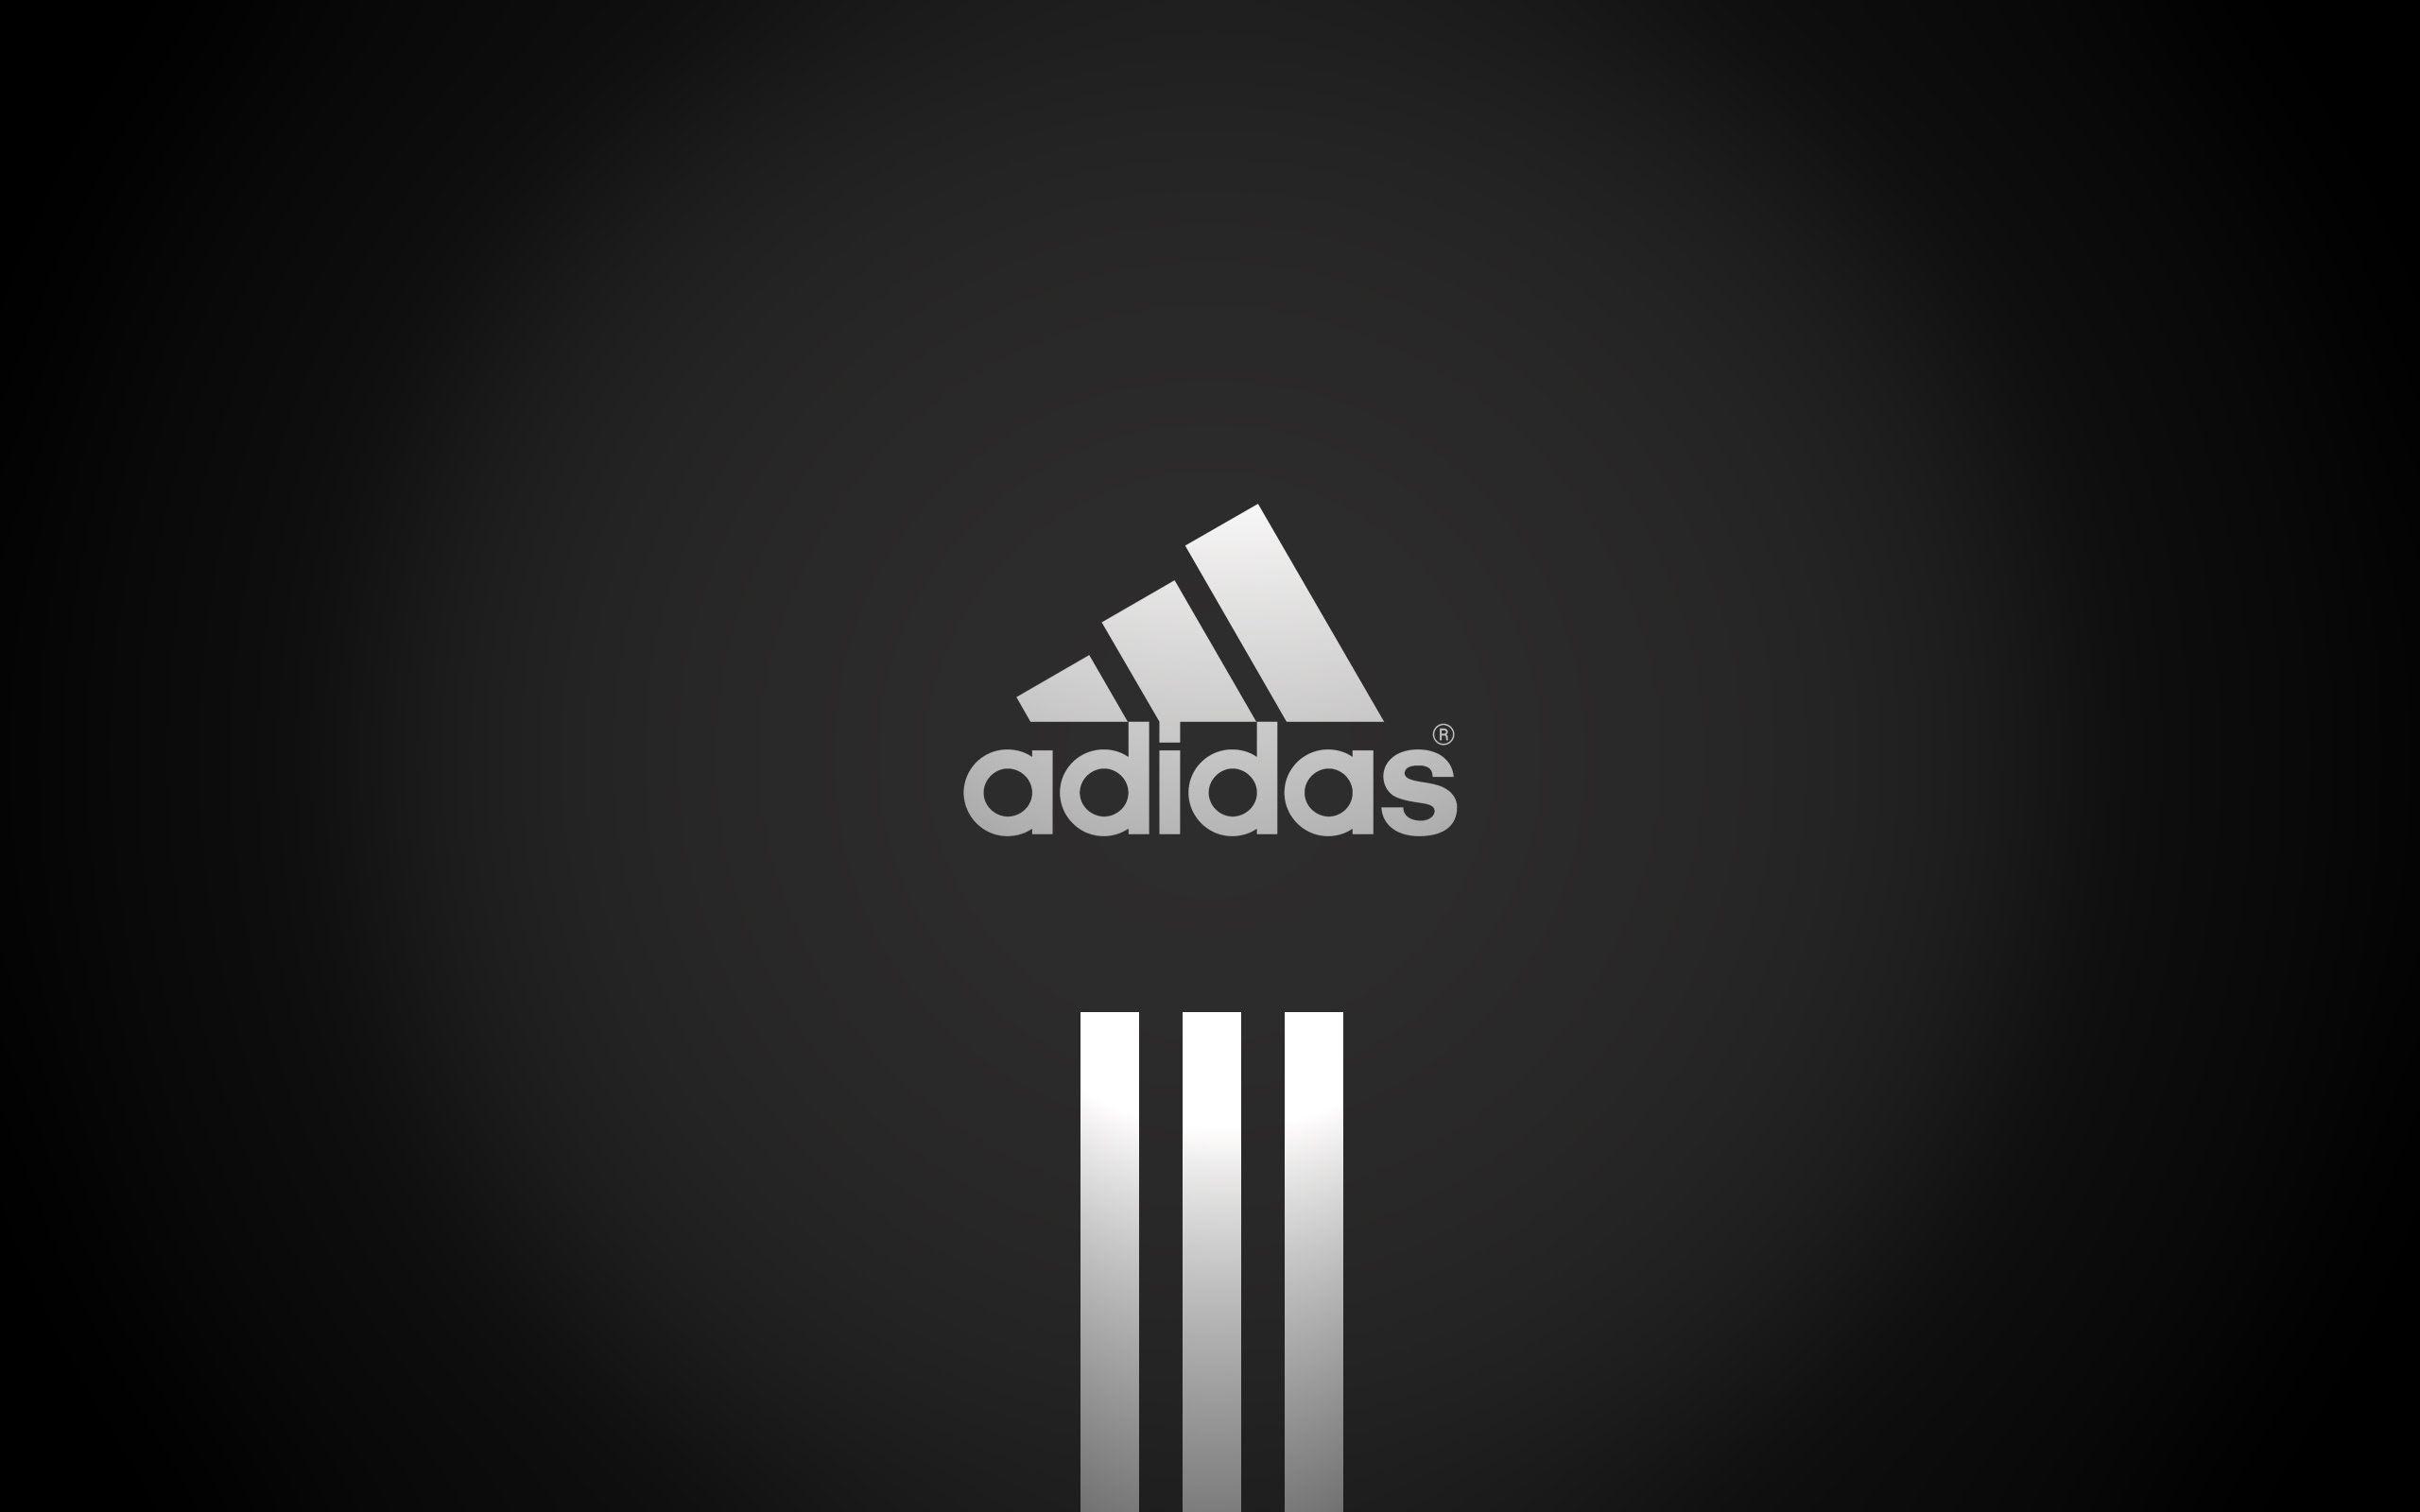 Pin By Kaila Poulsen On Addidas Adidas Wallpaper Backgrounds Adidas Logo Wallpapers Adidas Wallpapers